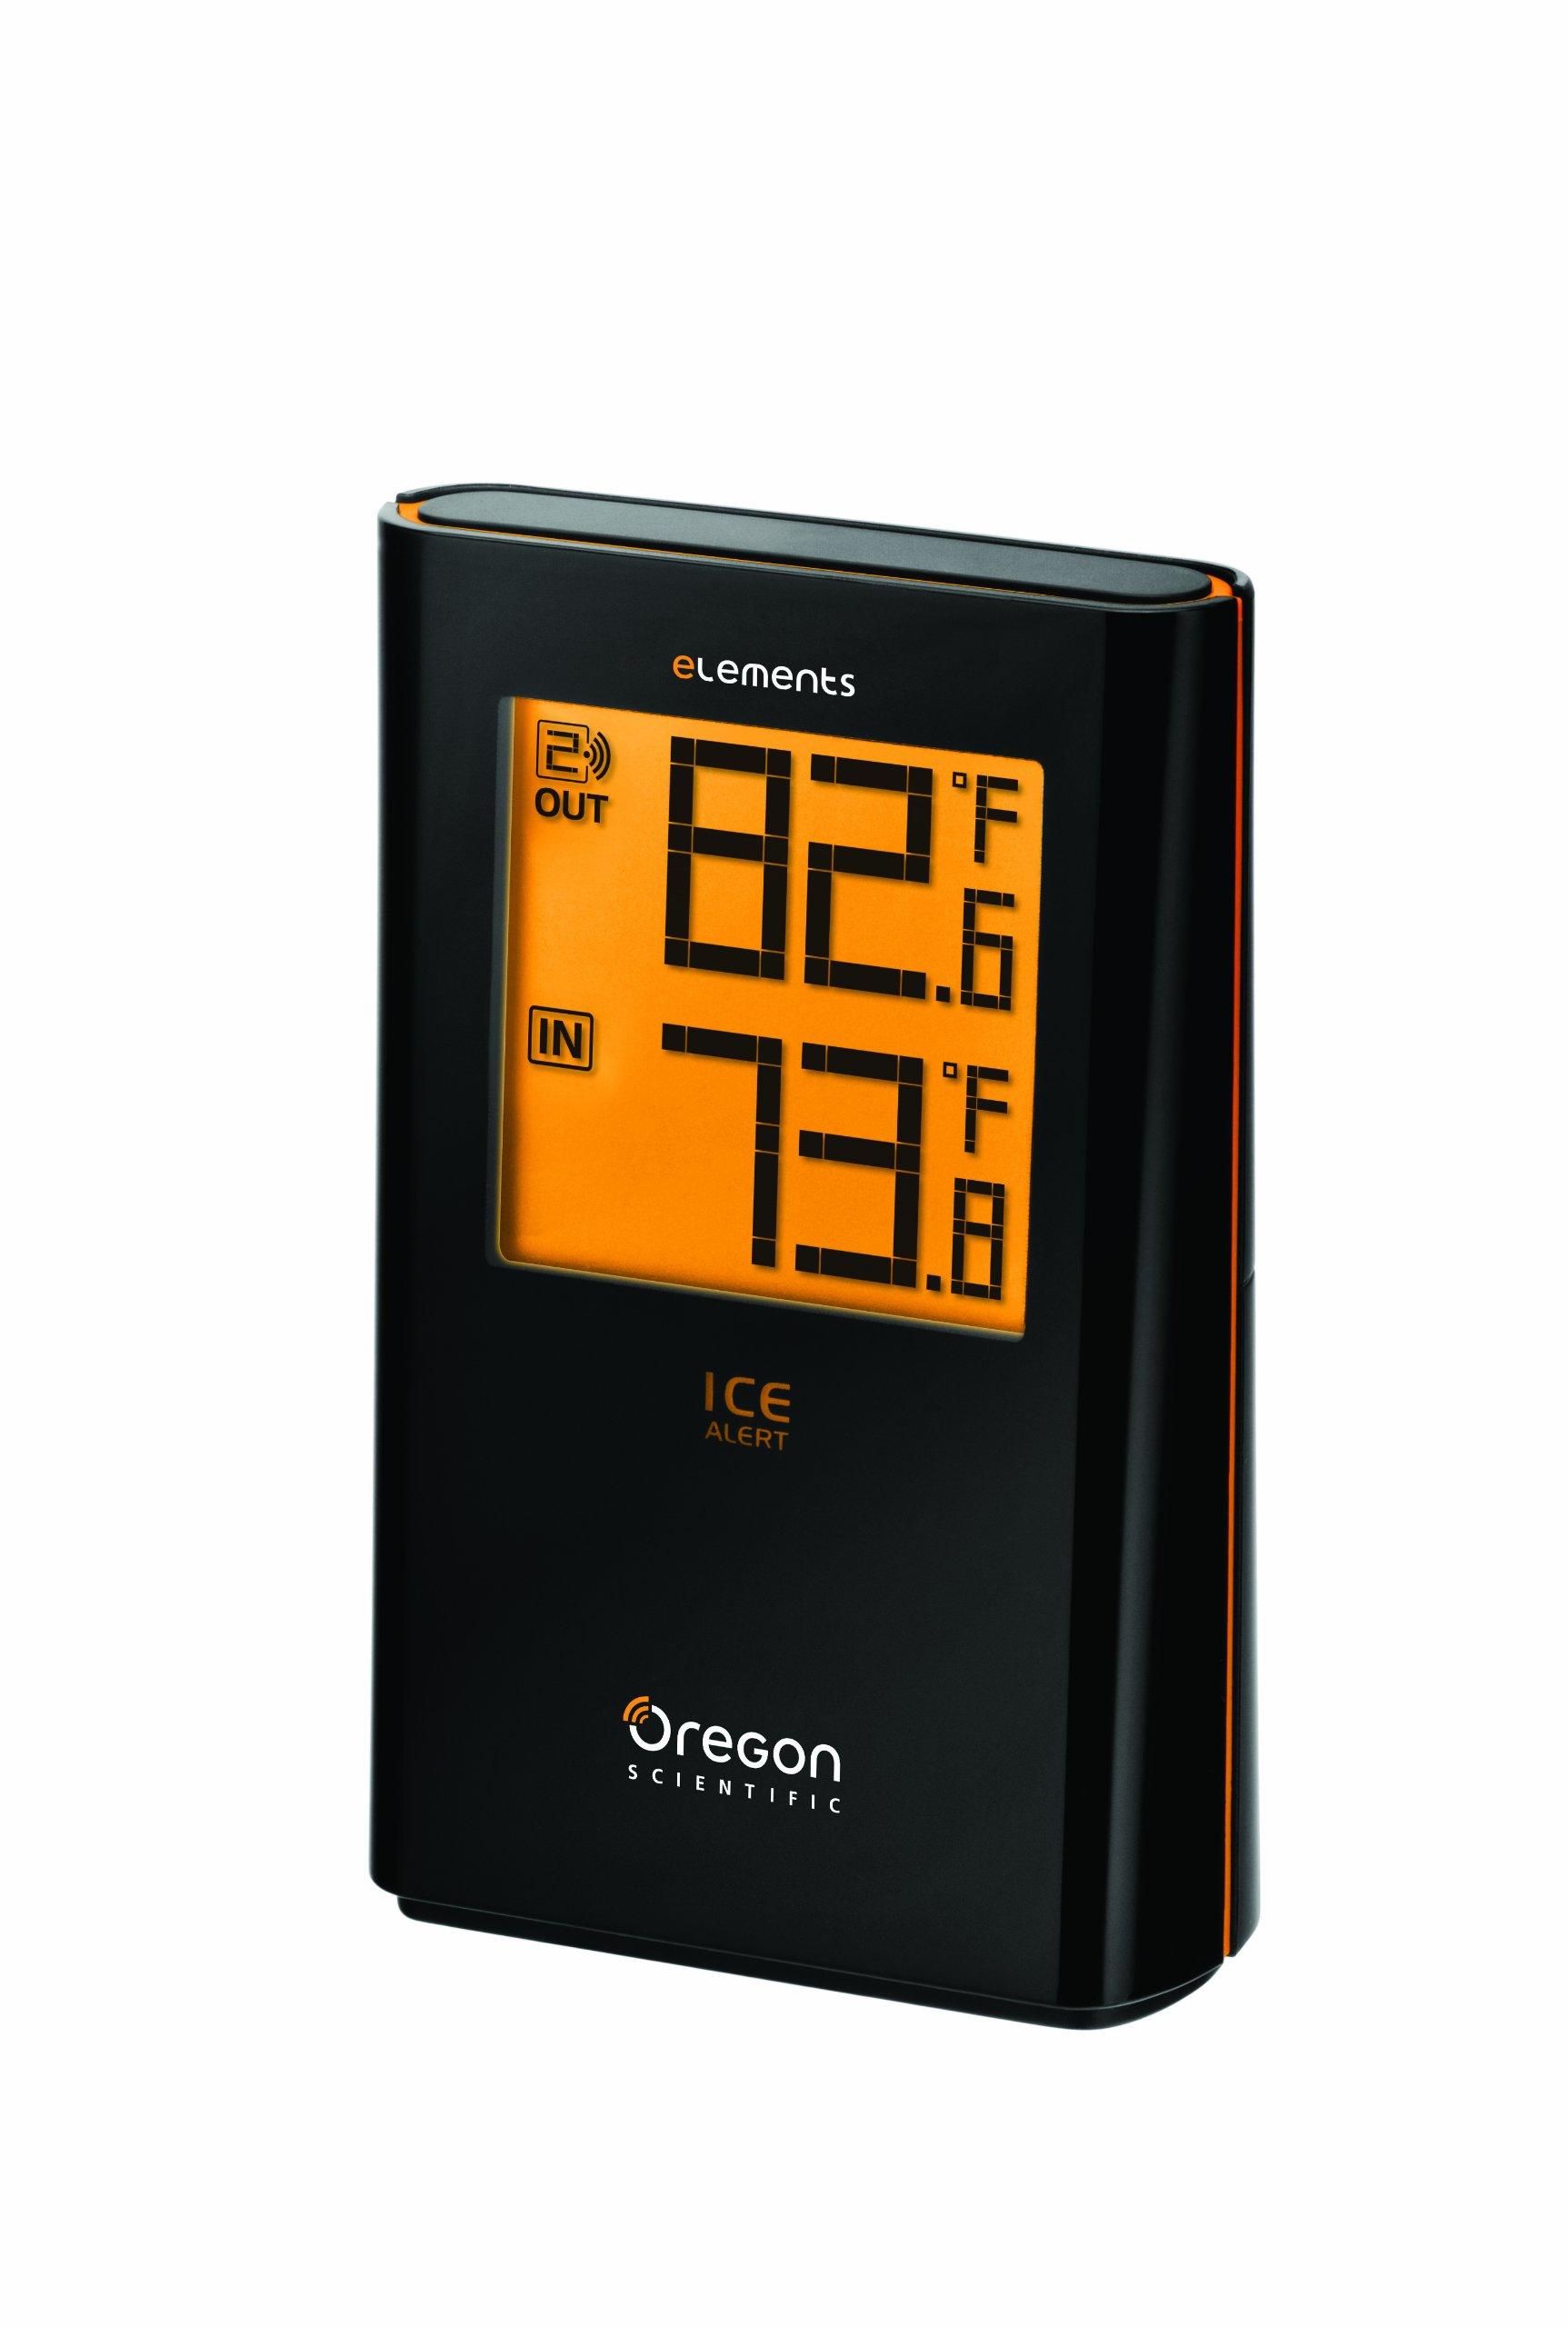 Oregon Scientific EW91 Wireless Indoor/Outdoor Thermometer with Ice Alert